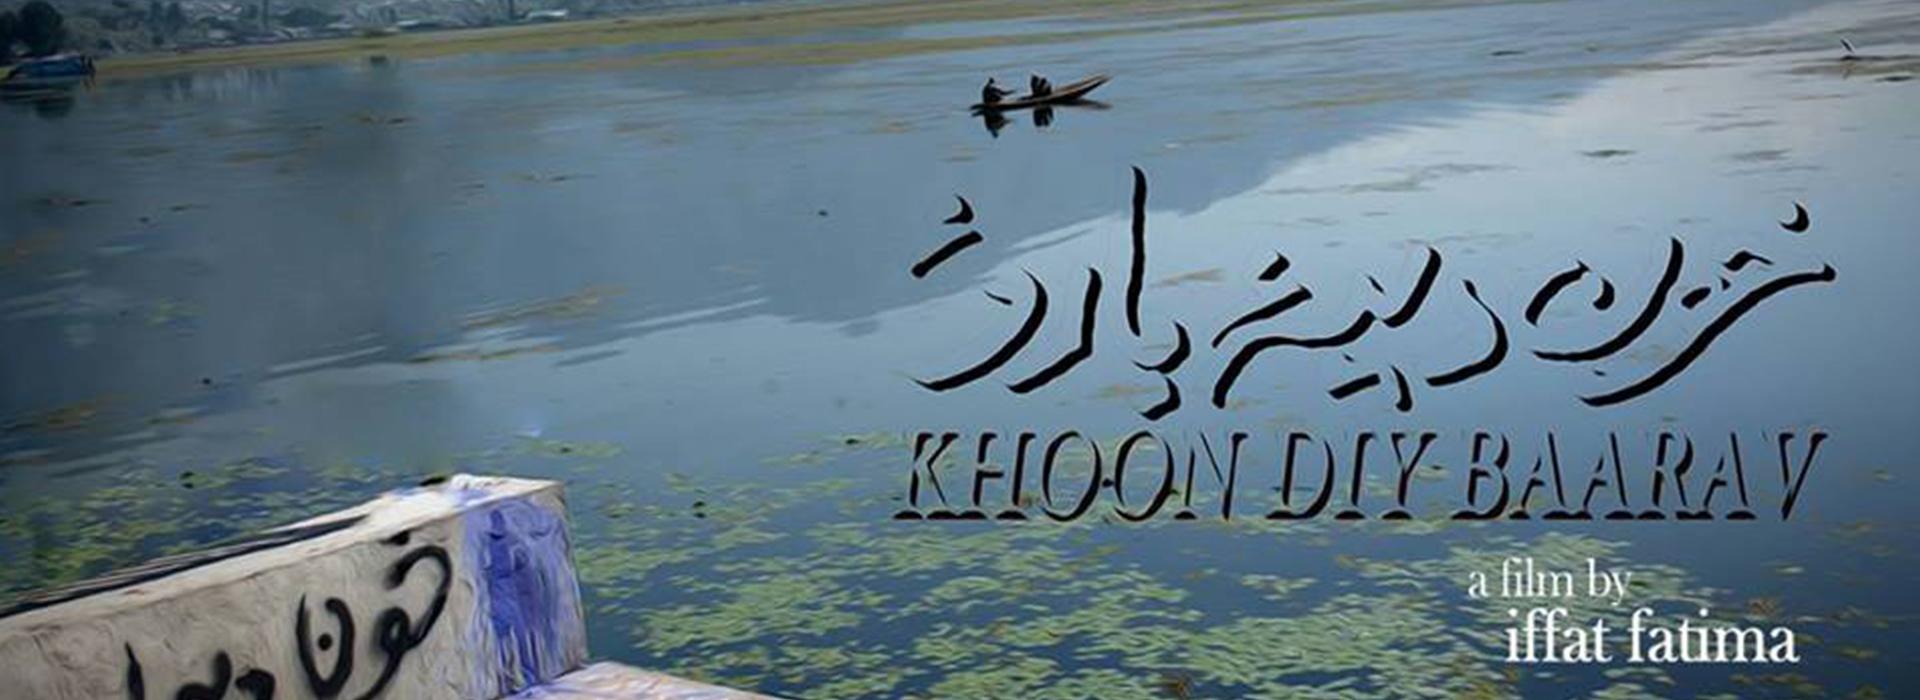 Documentary 'Khoon Diy Baarav (Blood Leaves Its Trail)' to be shown at CSUSB Nov. 13